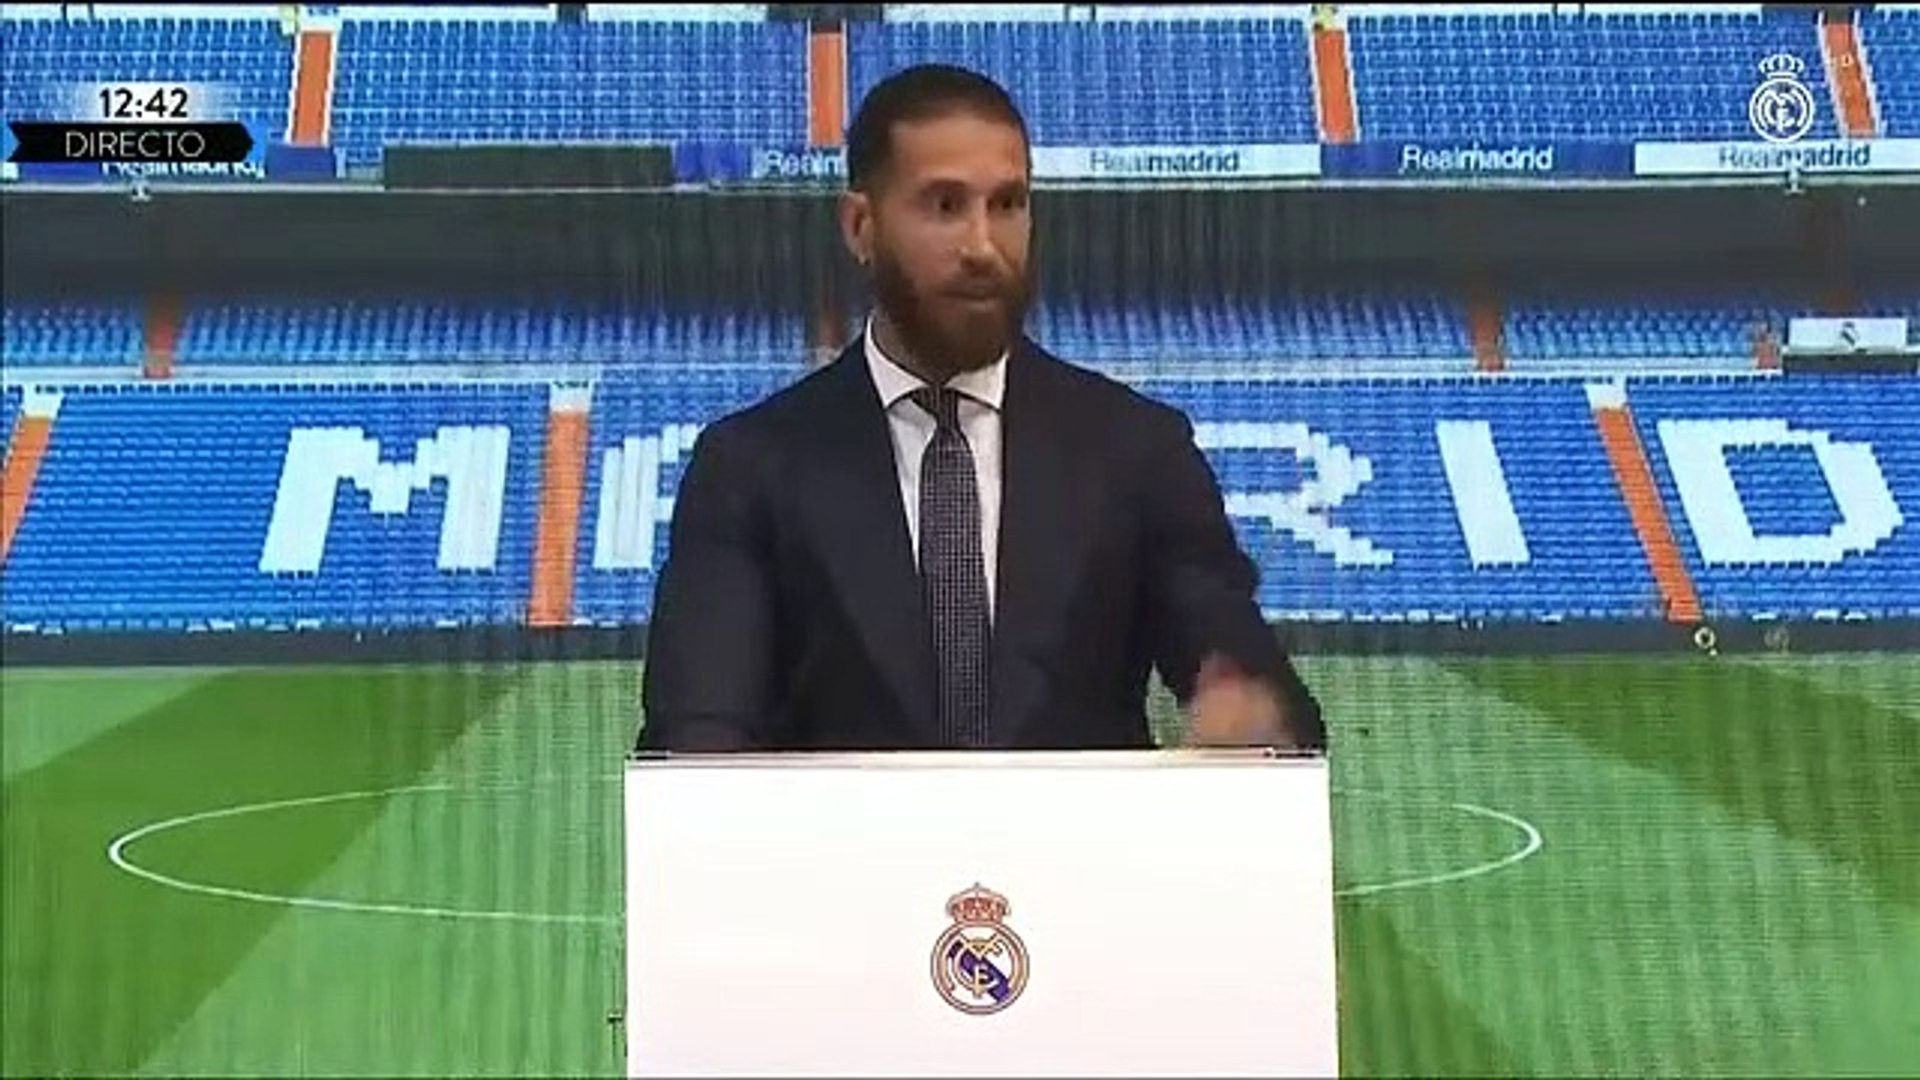 Sergio Ramos gözyaşlarını tutamadı